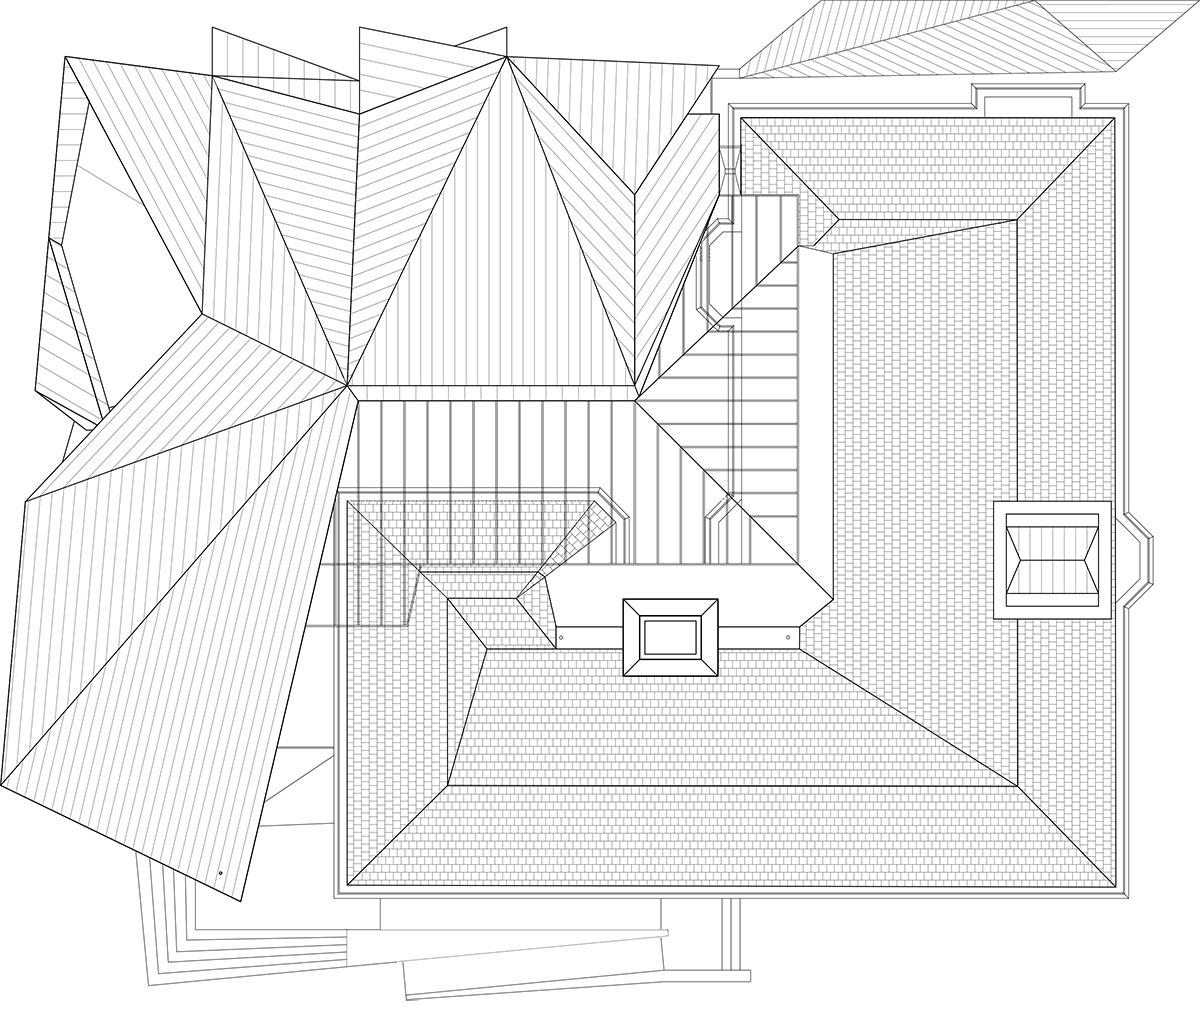 11-world-maritime-university-kim-utzon-architecture-terroir